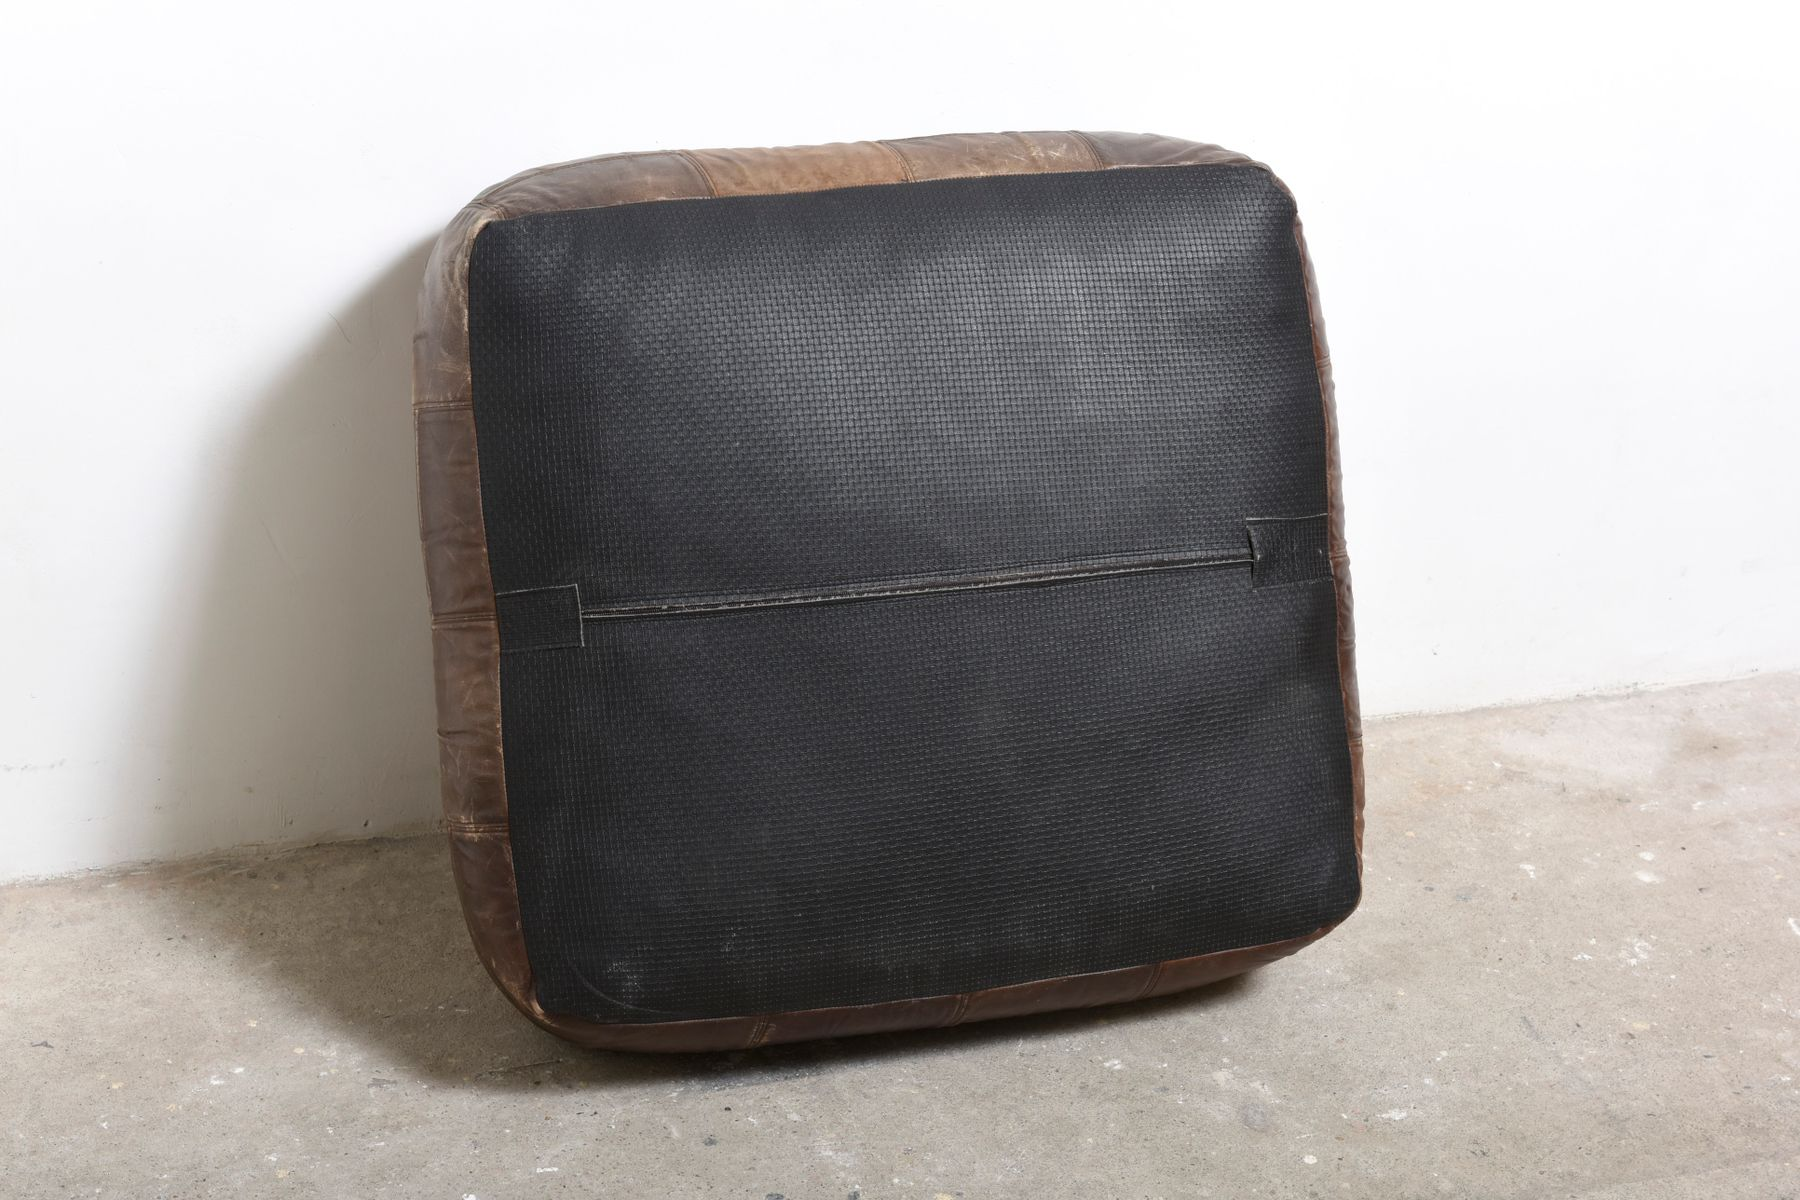 mid century patchwork ottomane aus leder von de sede 1976. Black Bedroom Furniture Sets. Home Design Ideas